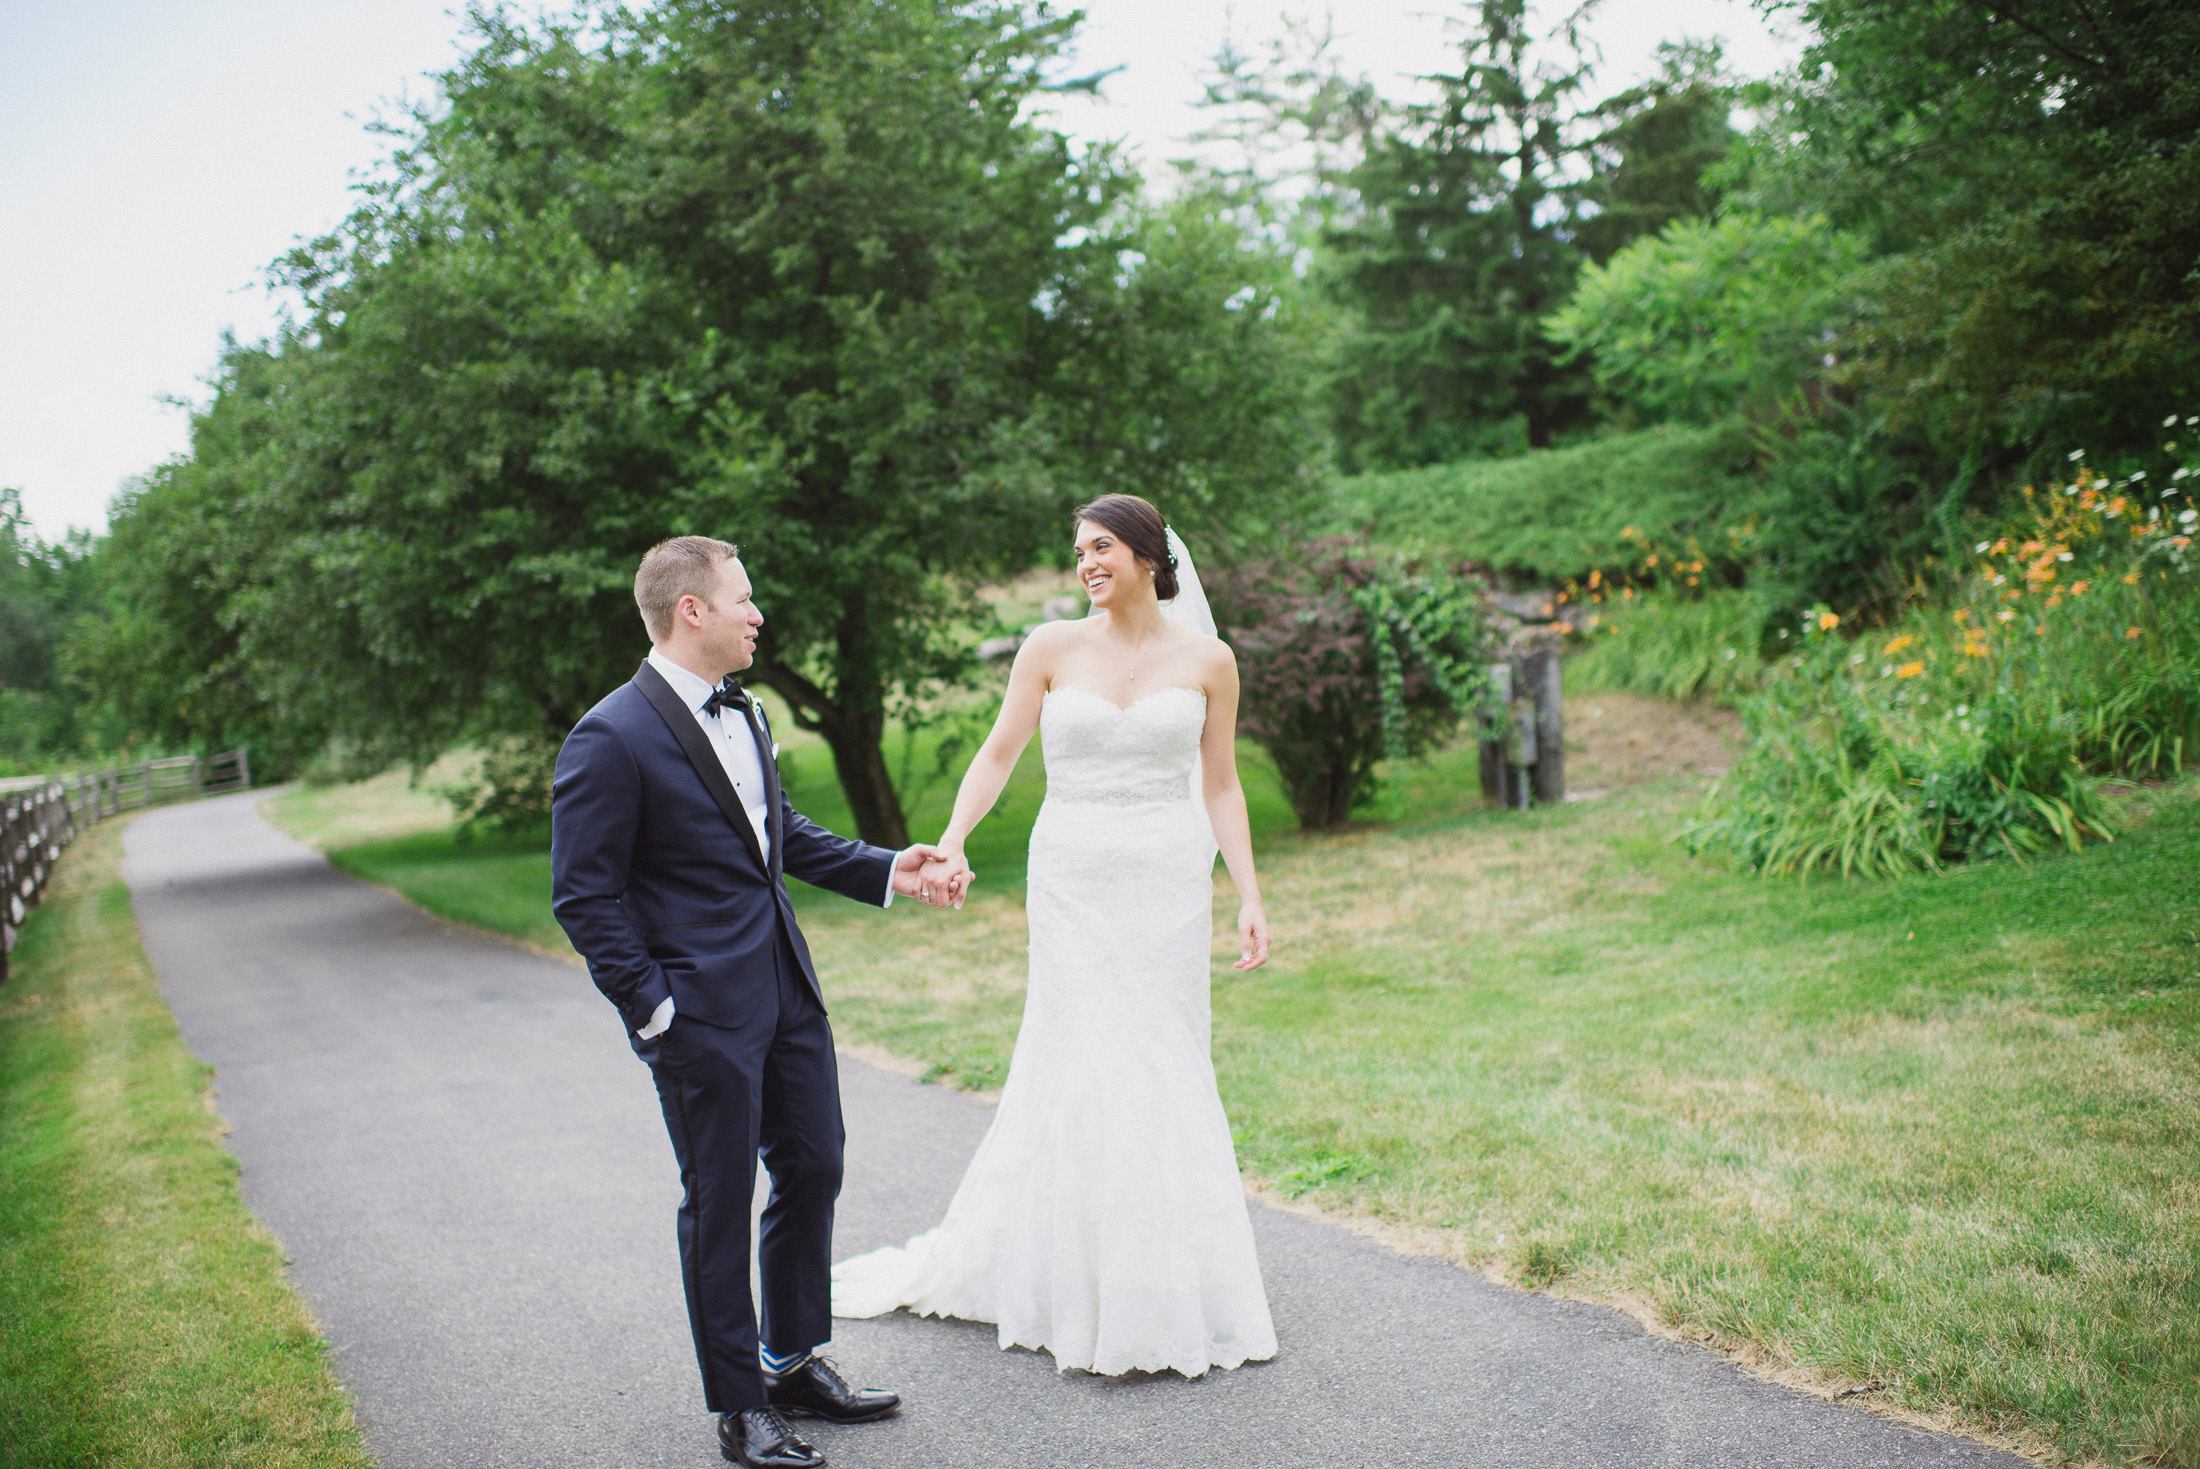 NH Wedding Photographer: walking on path